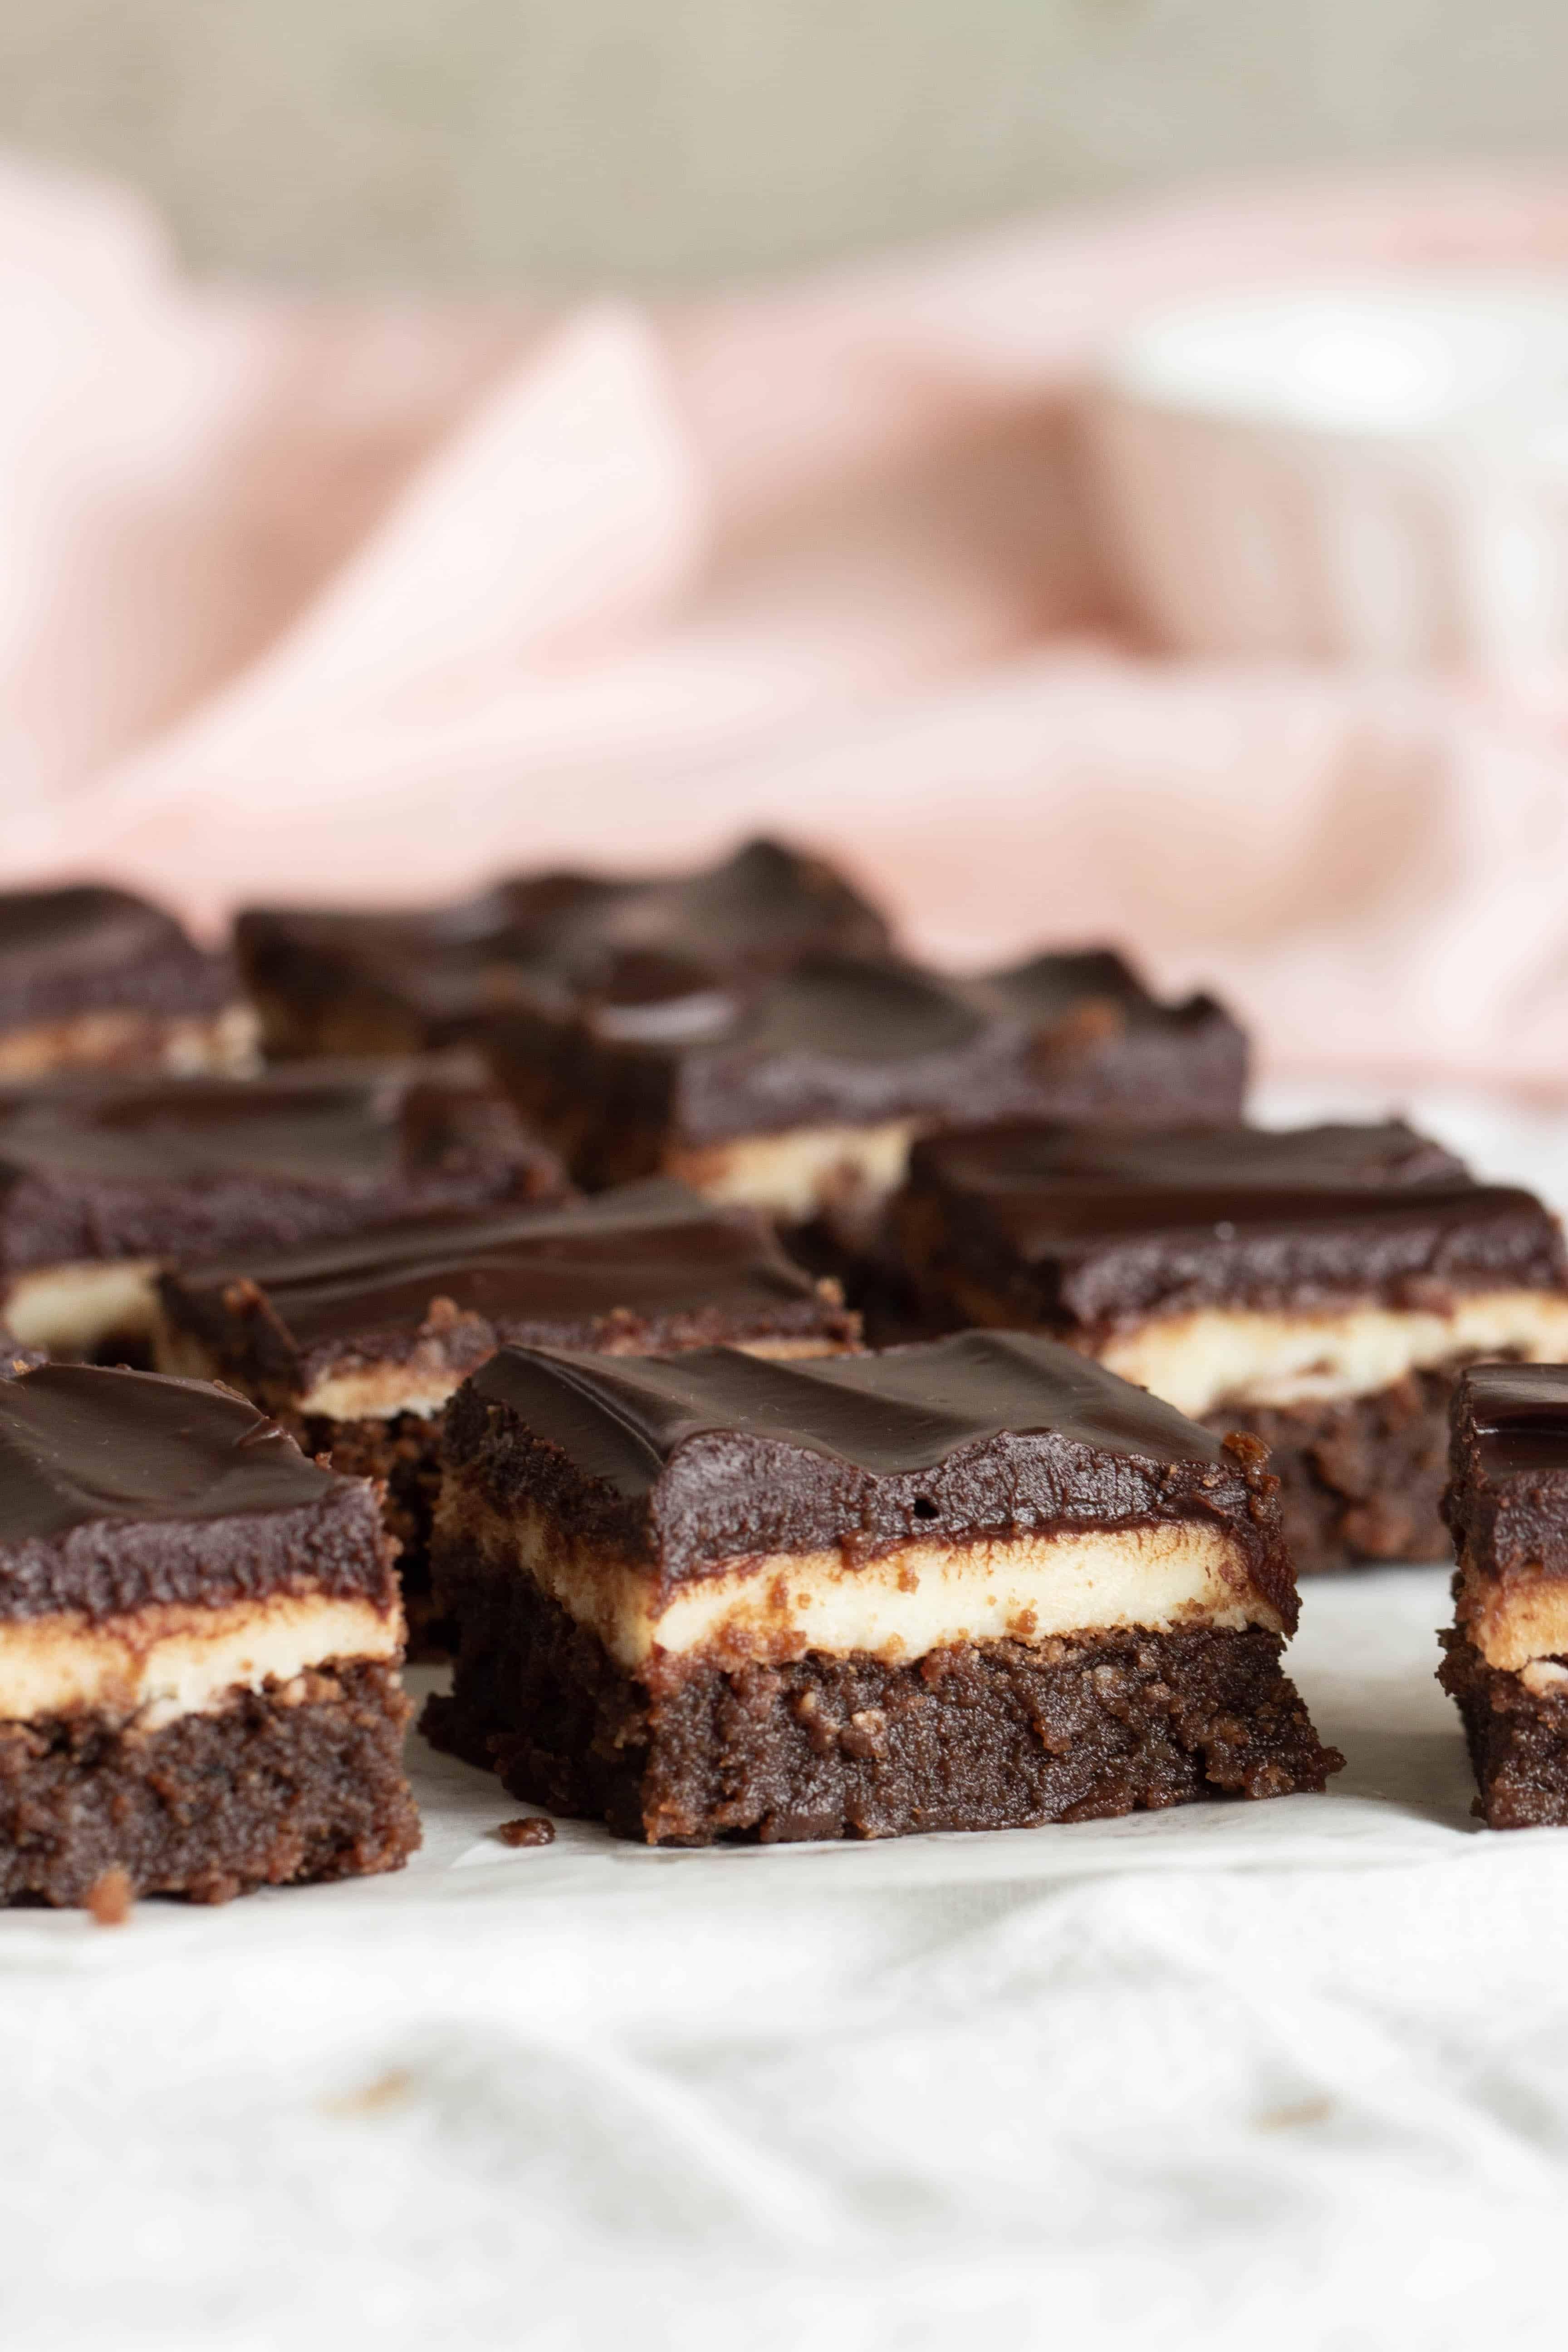 Chocolate Peppermint Cake Recipe by Lauren Gordon